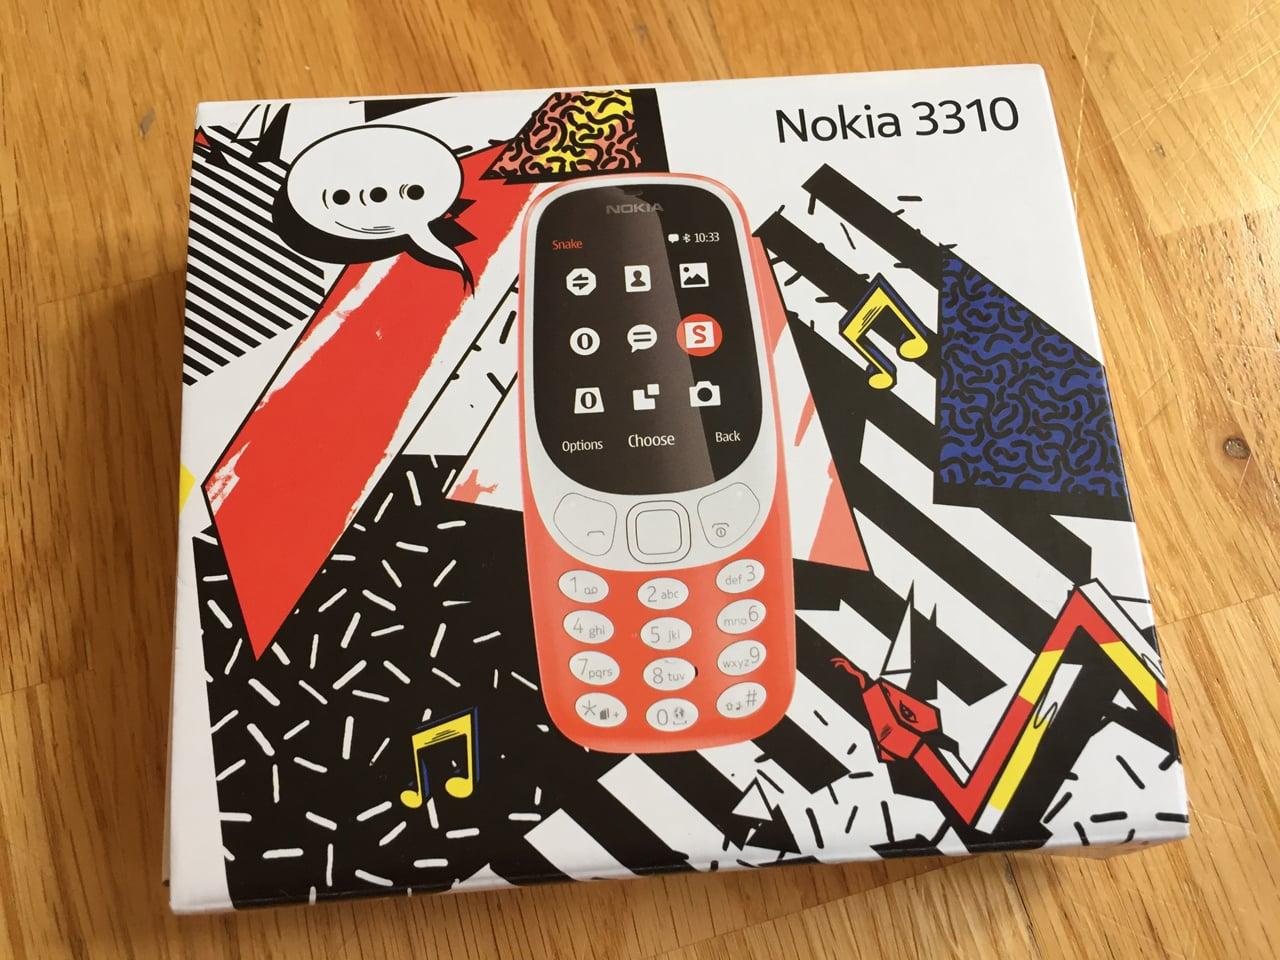 Znovuzrozená Nokia 3310